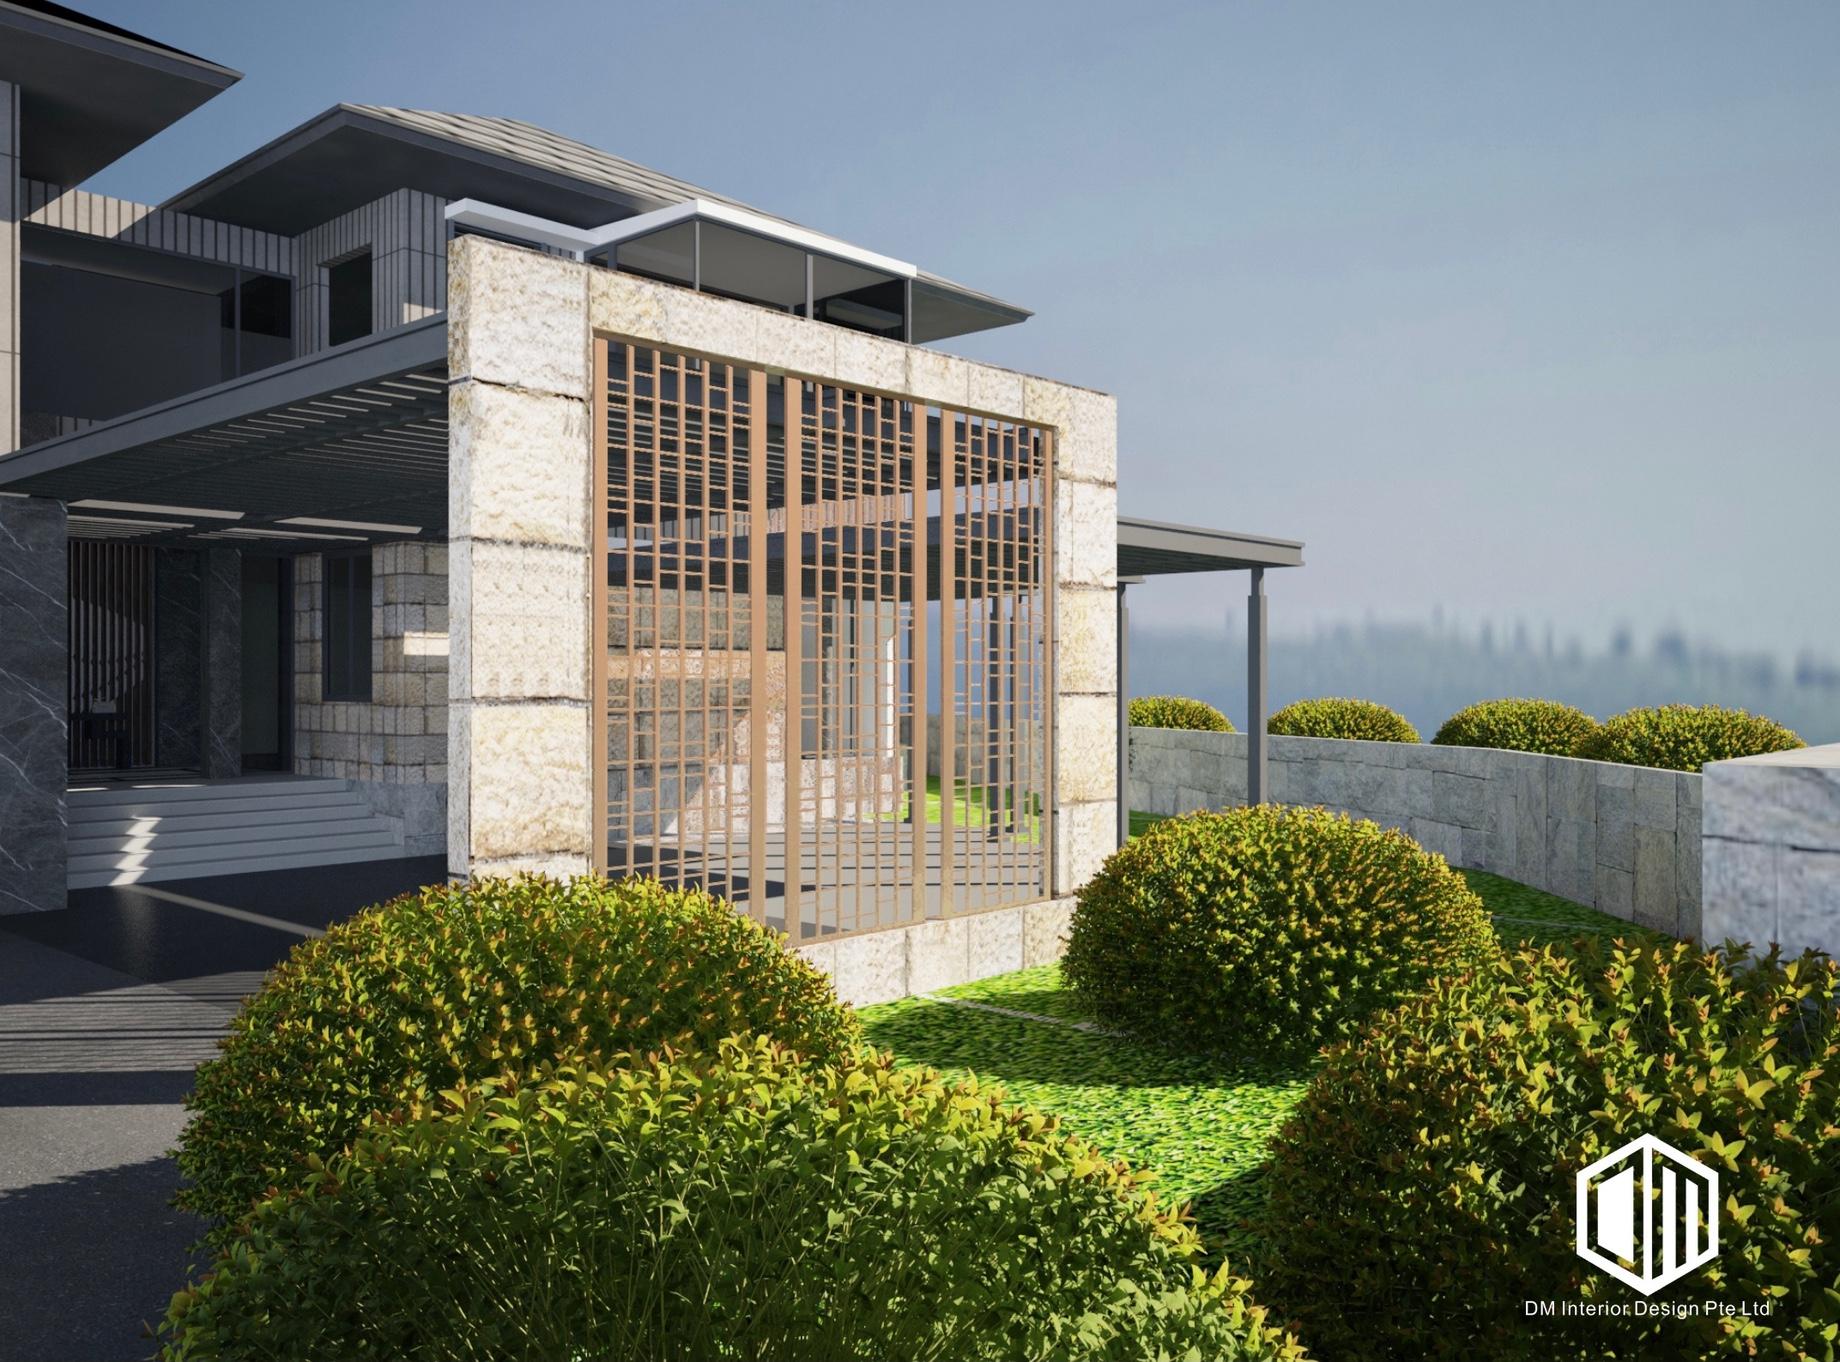 DM Interior Design - The Good Class Bungalow Elite Residential Project - Singapore